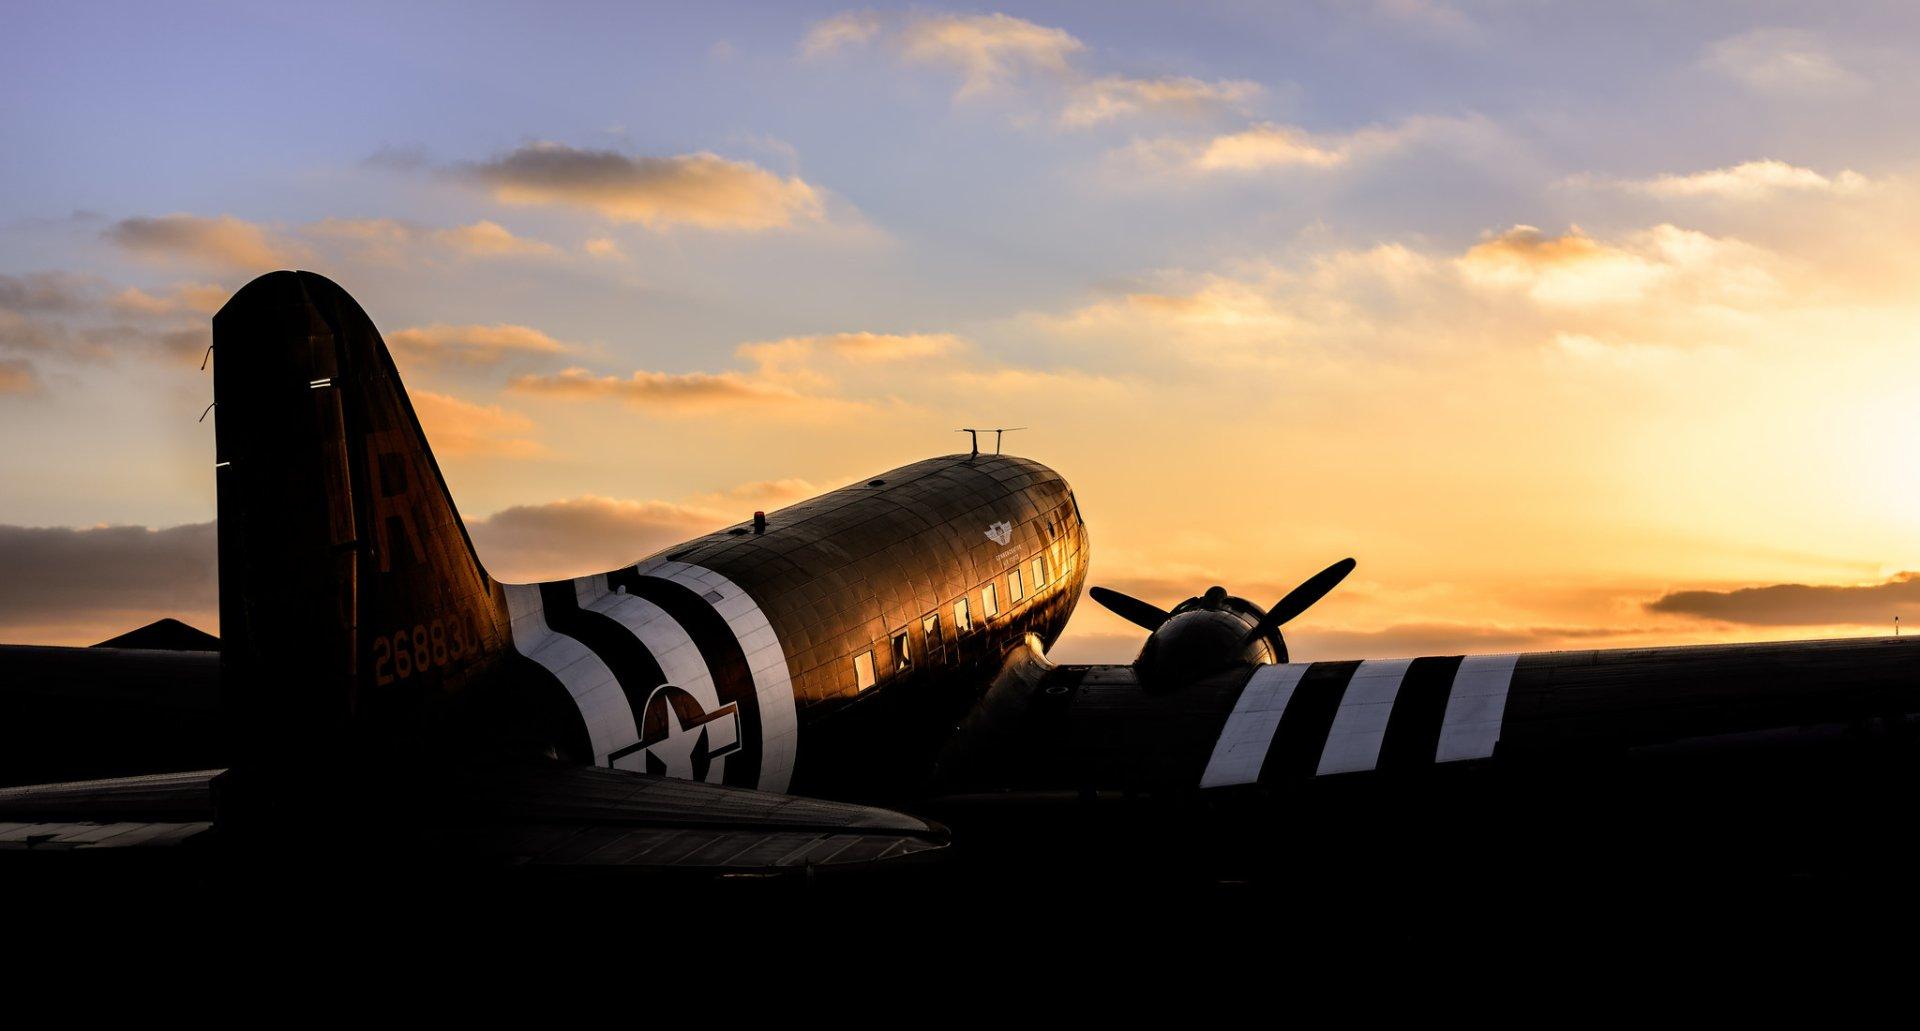 Military - Aircraft  Warplane Douglas C-47 Skytrain Transport Aircraft Wallpaper